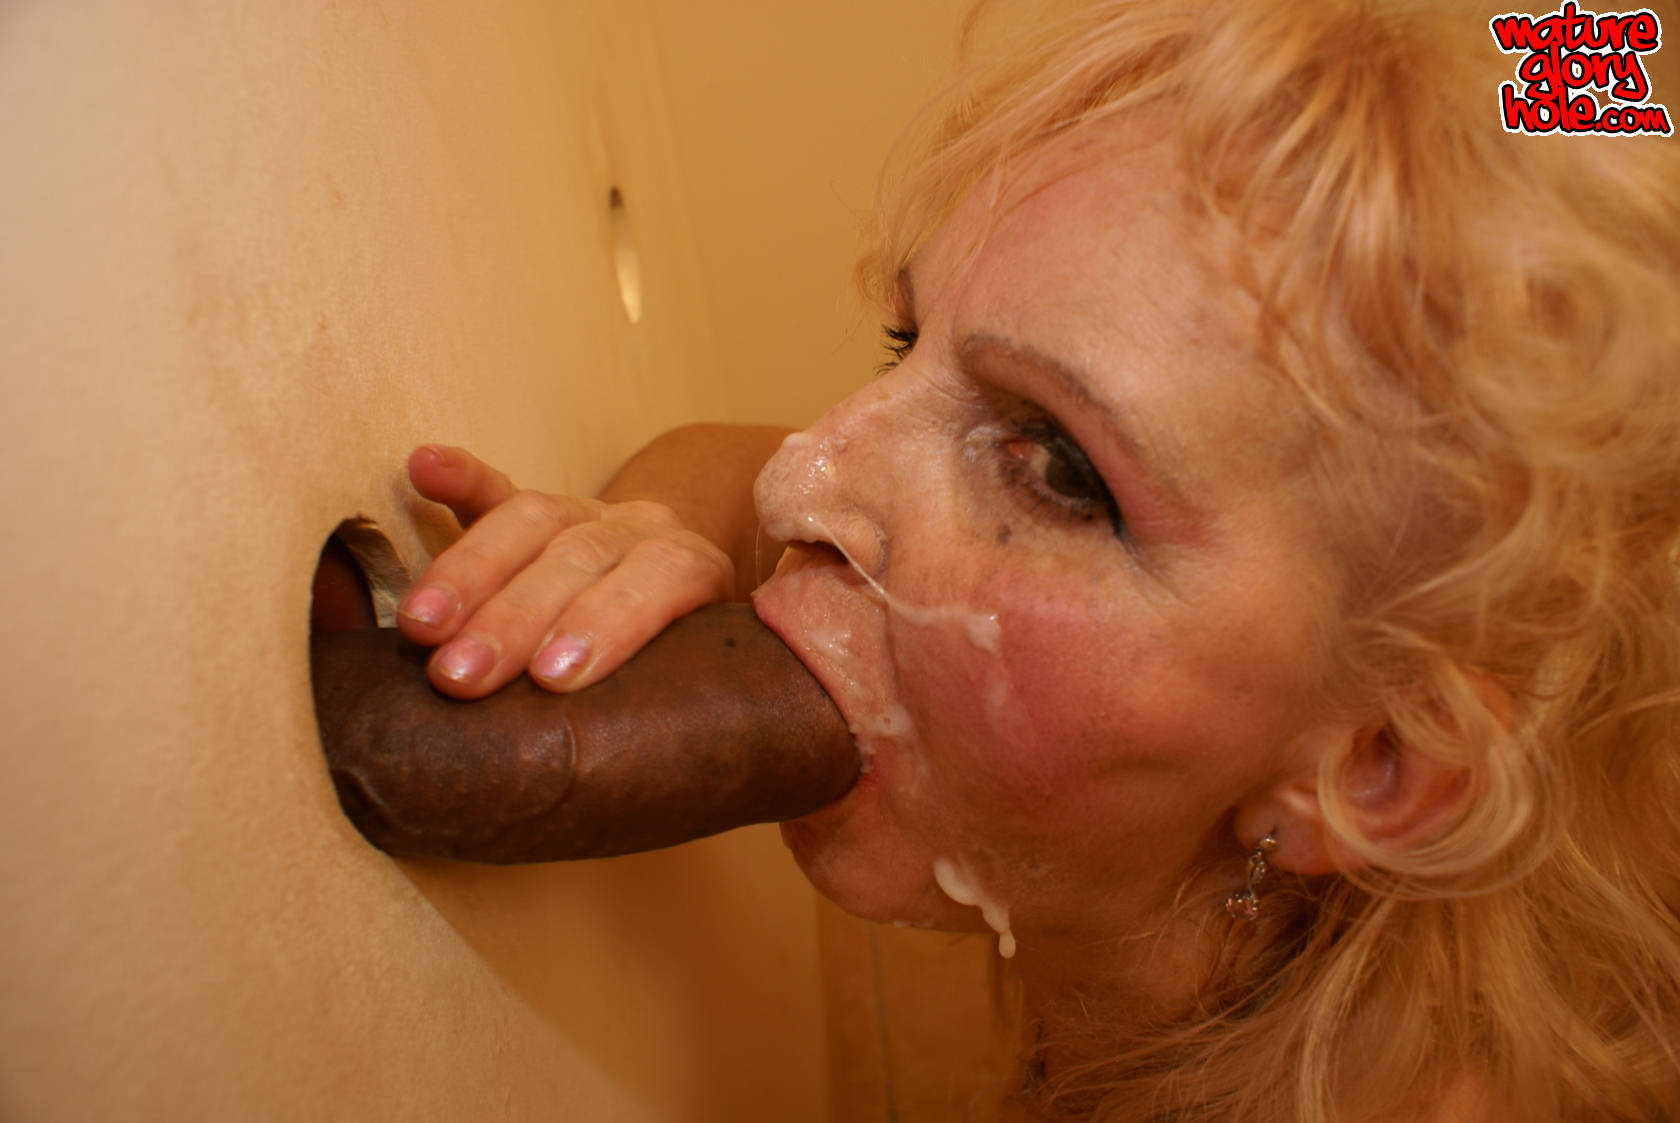 porno-zalil-spermoy-cherez-dirku-v-tualete-foto